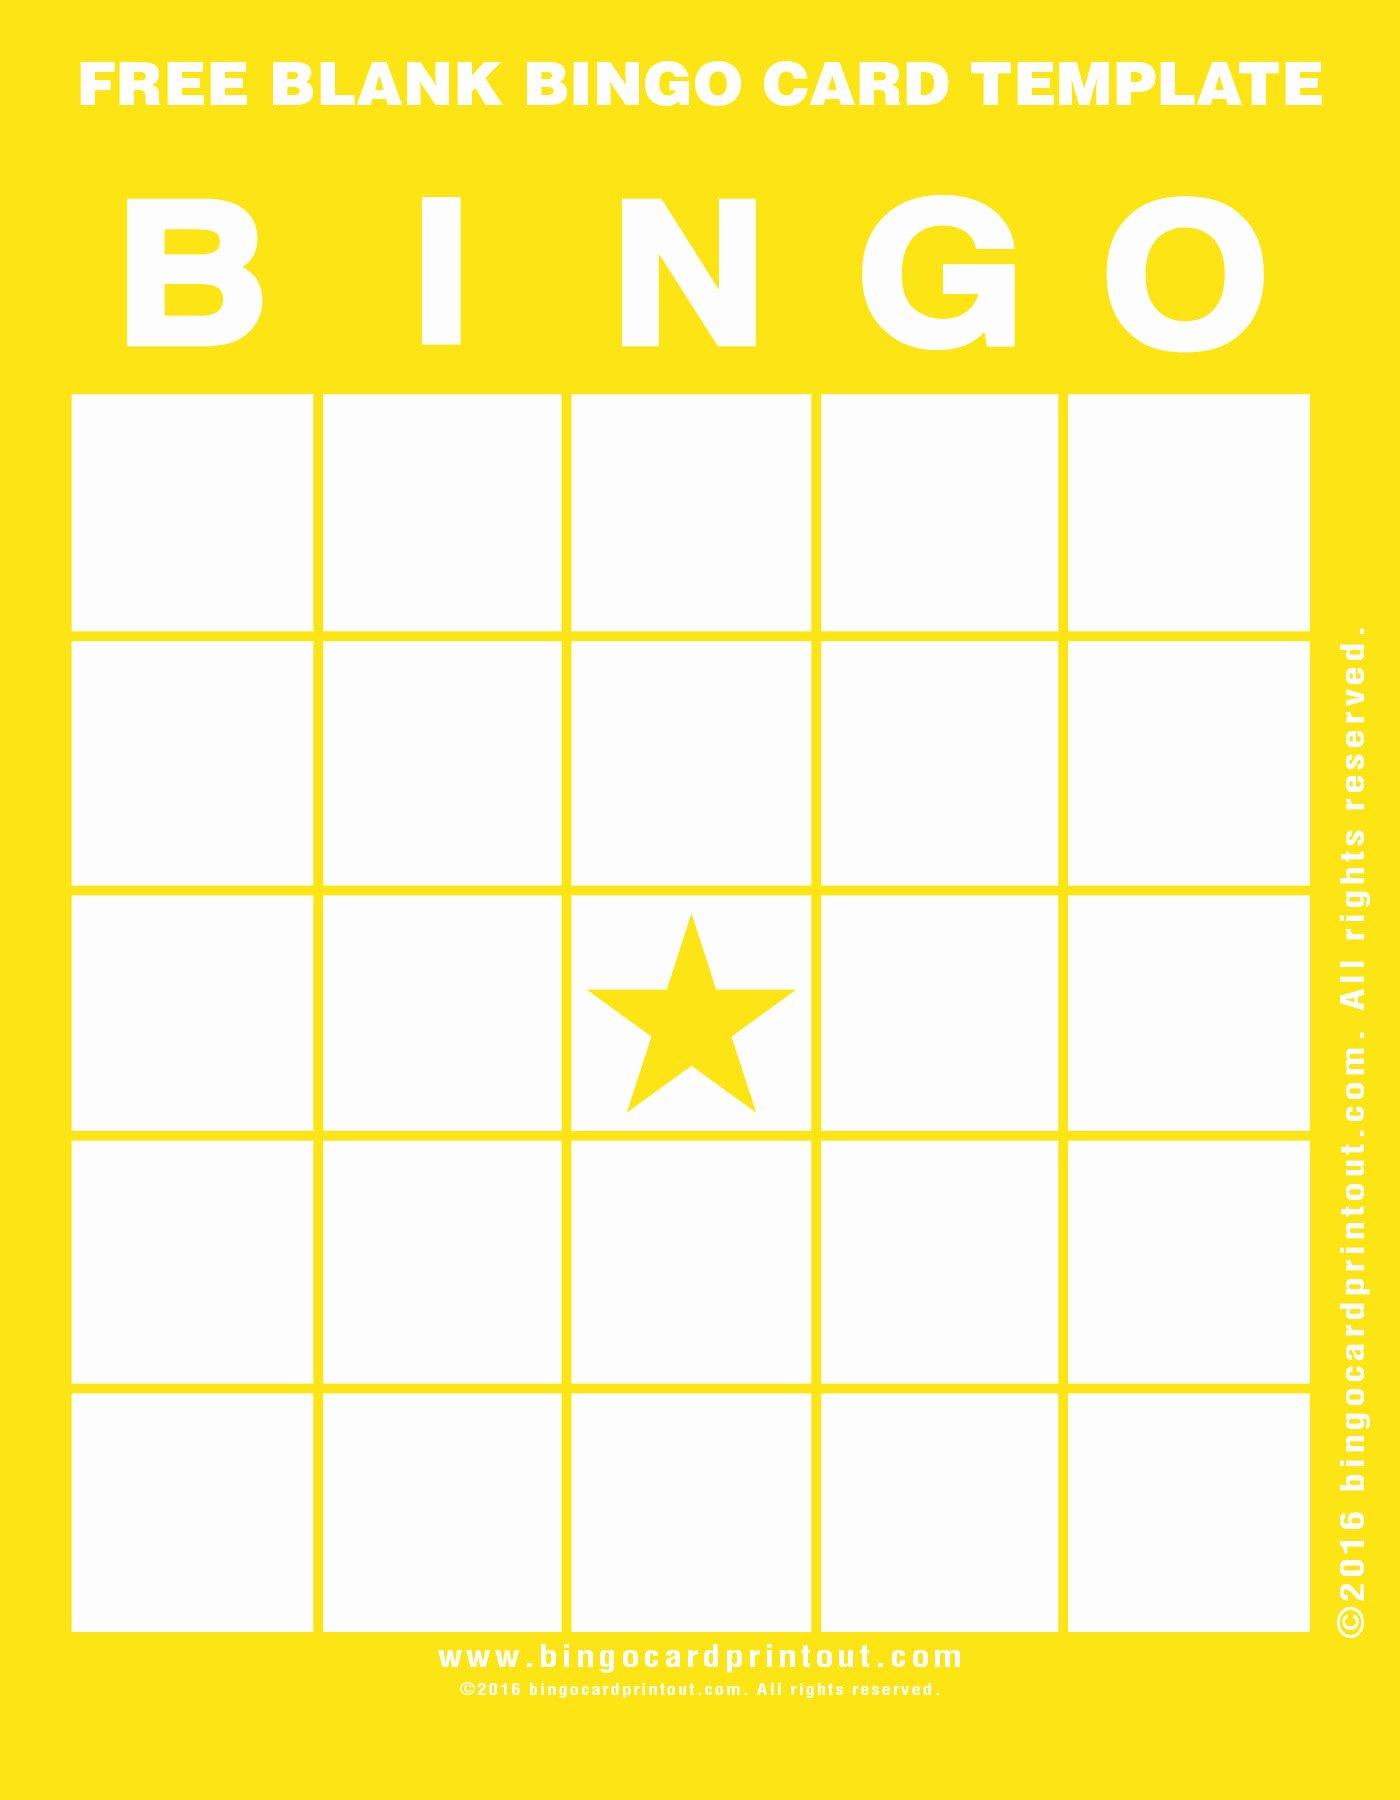 Free Blank Bingo Cards Awesome Free Blank Bingo Card Template Bingocardprintout